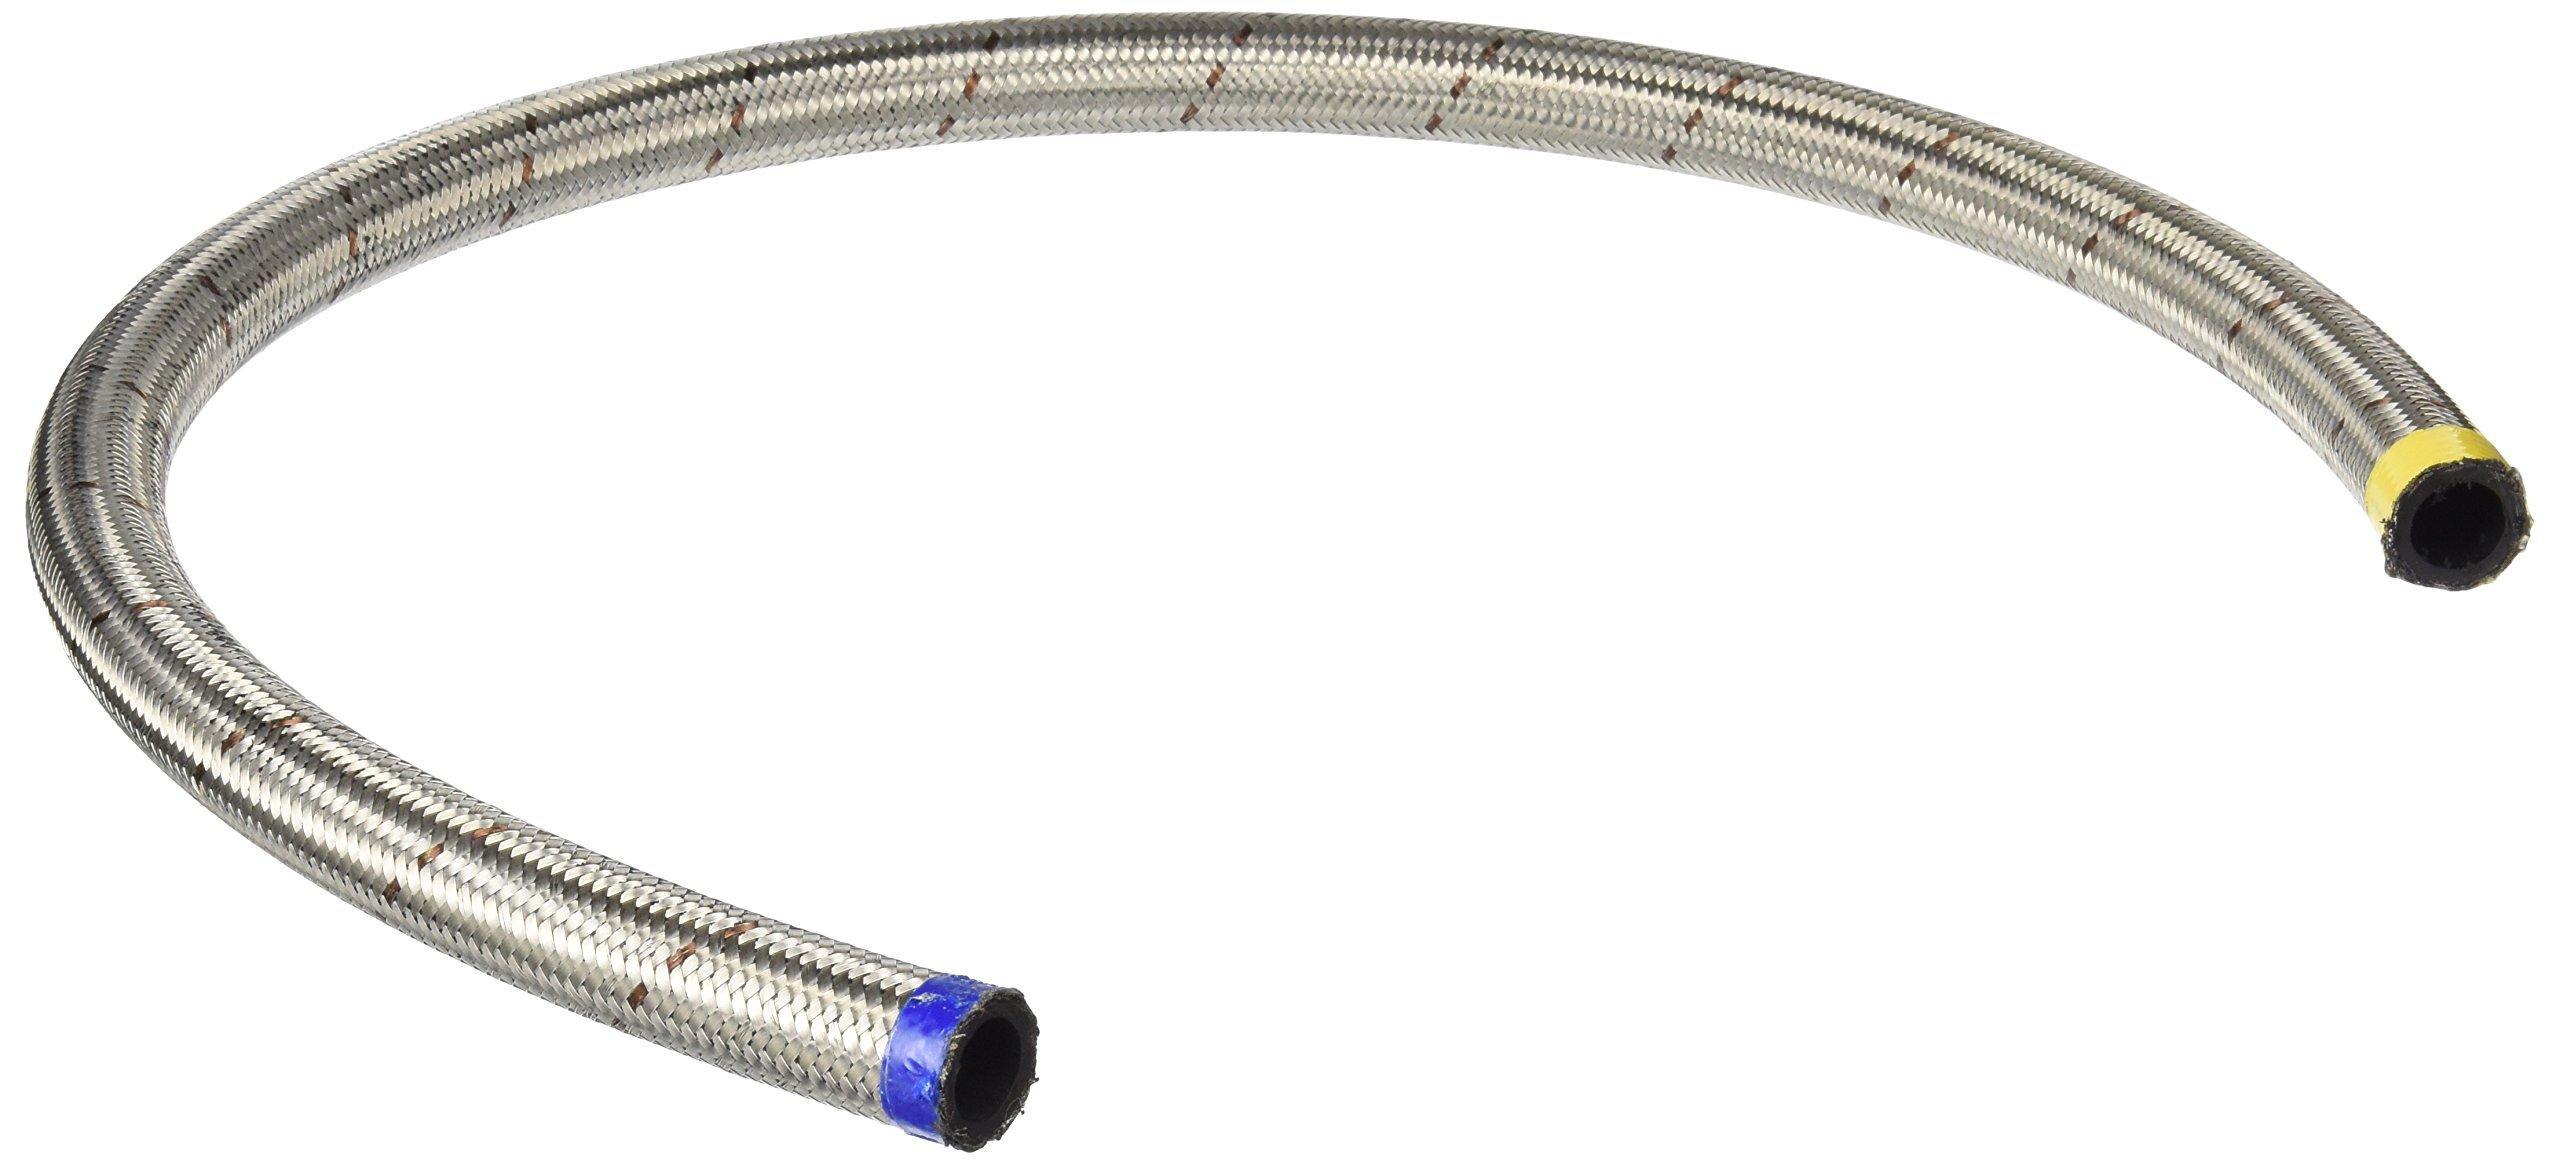 Earl's 403012 Perm-O-Flex Stainless Steel Braid -12AN Rubber Hose - 3 Feet